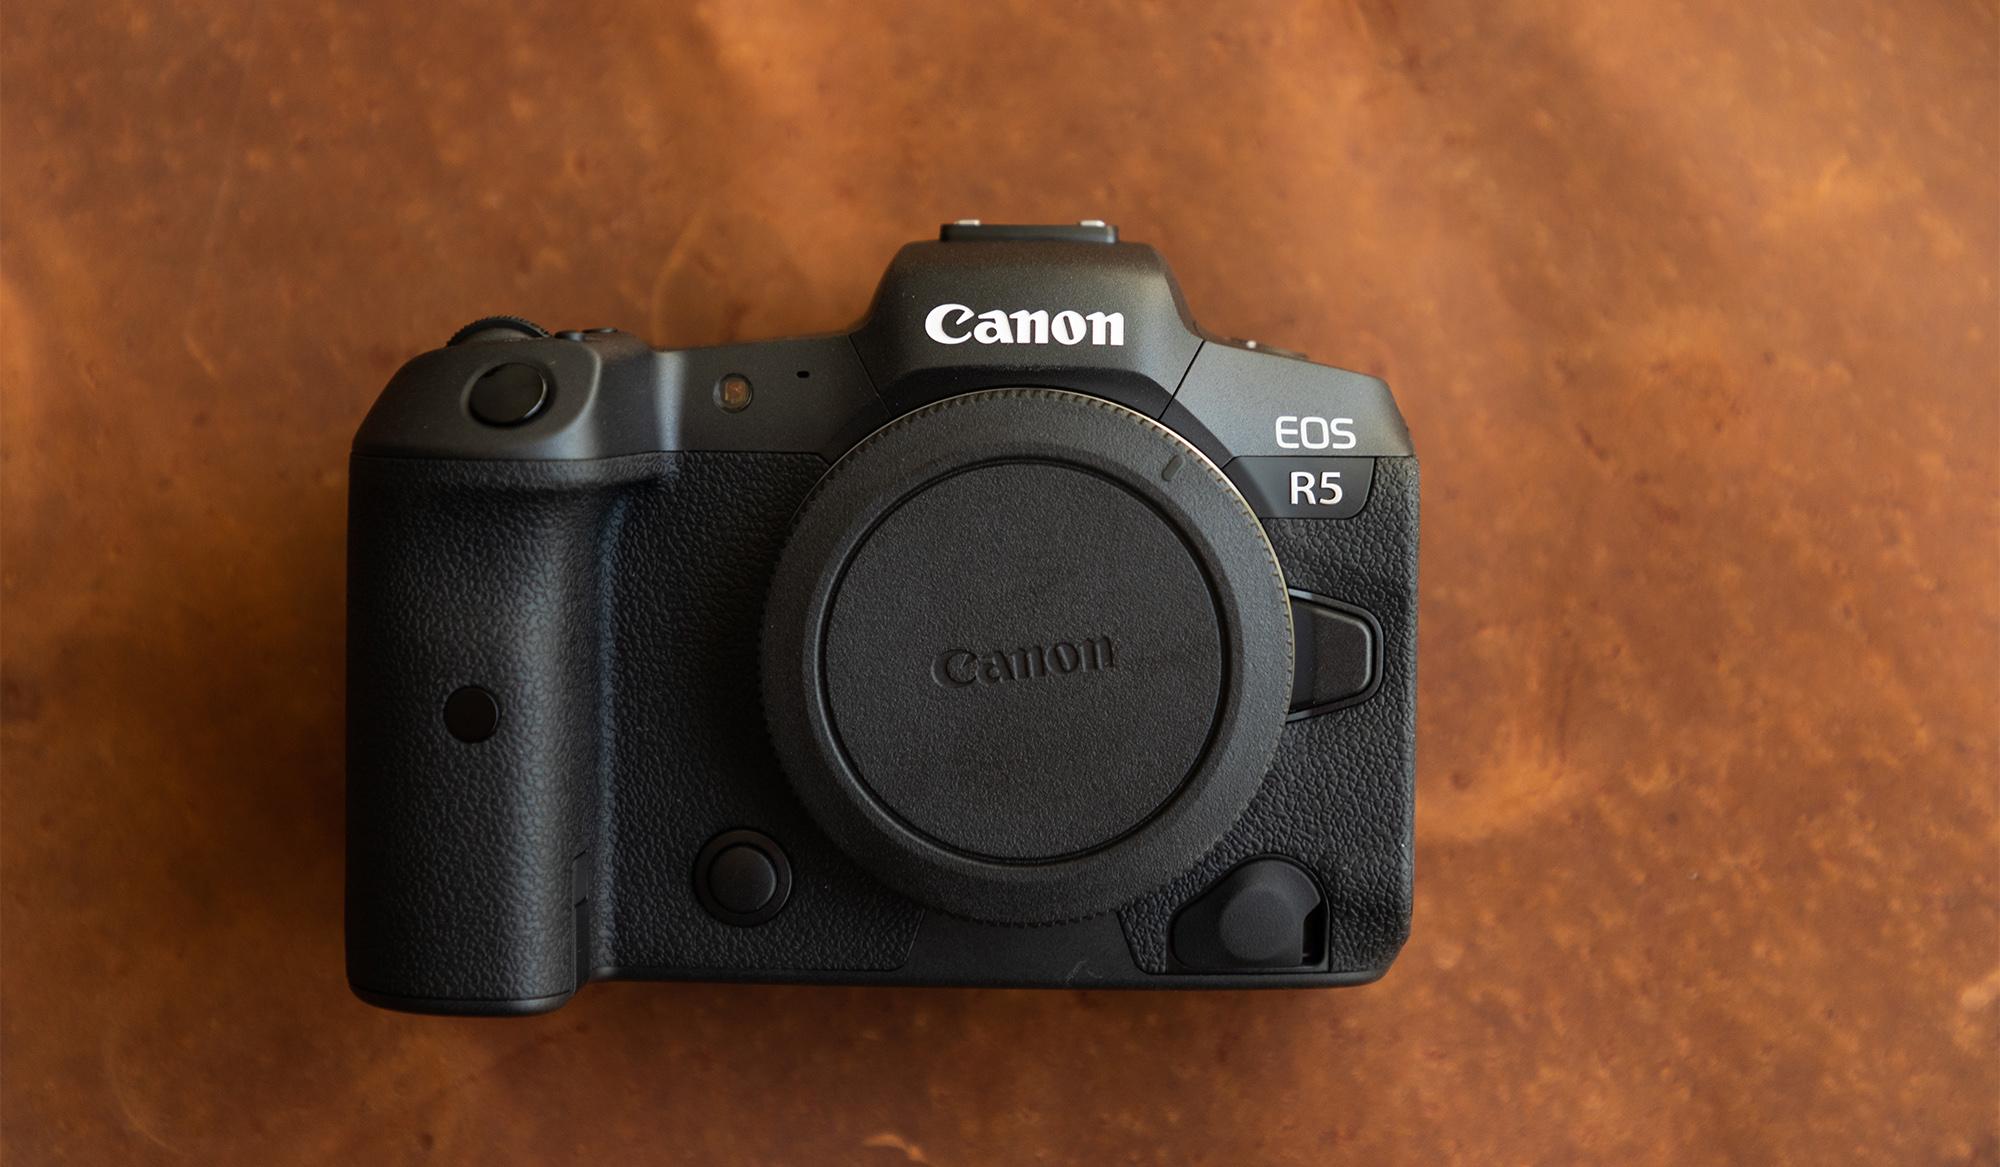 Taking Apart Canon R5